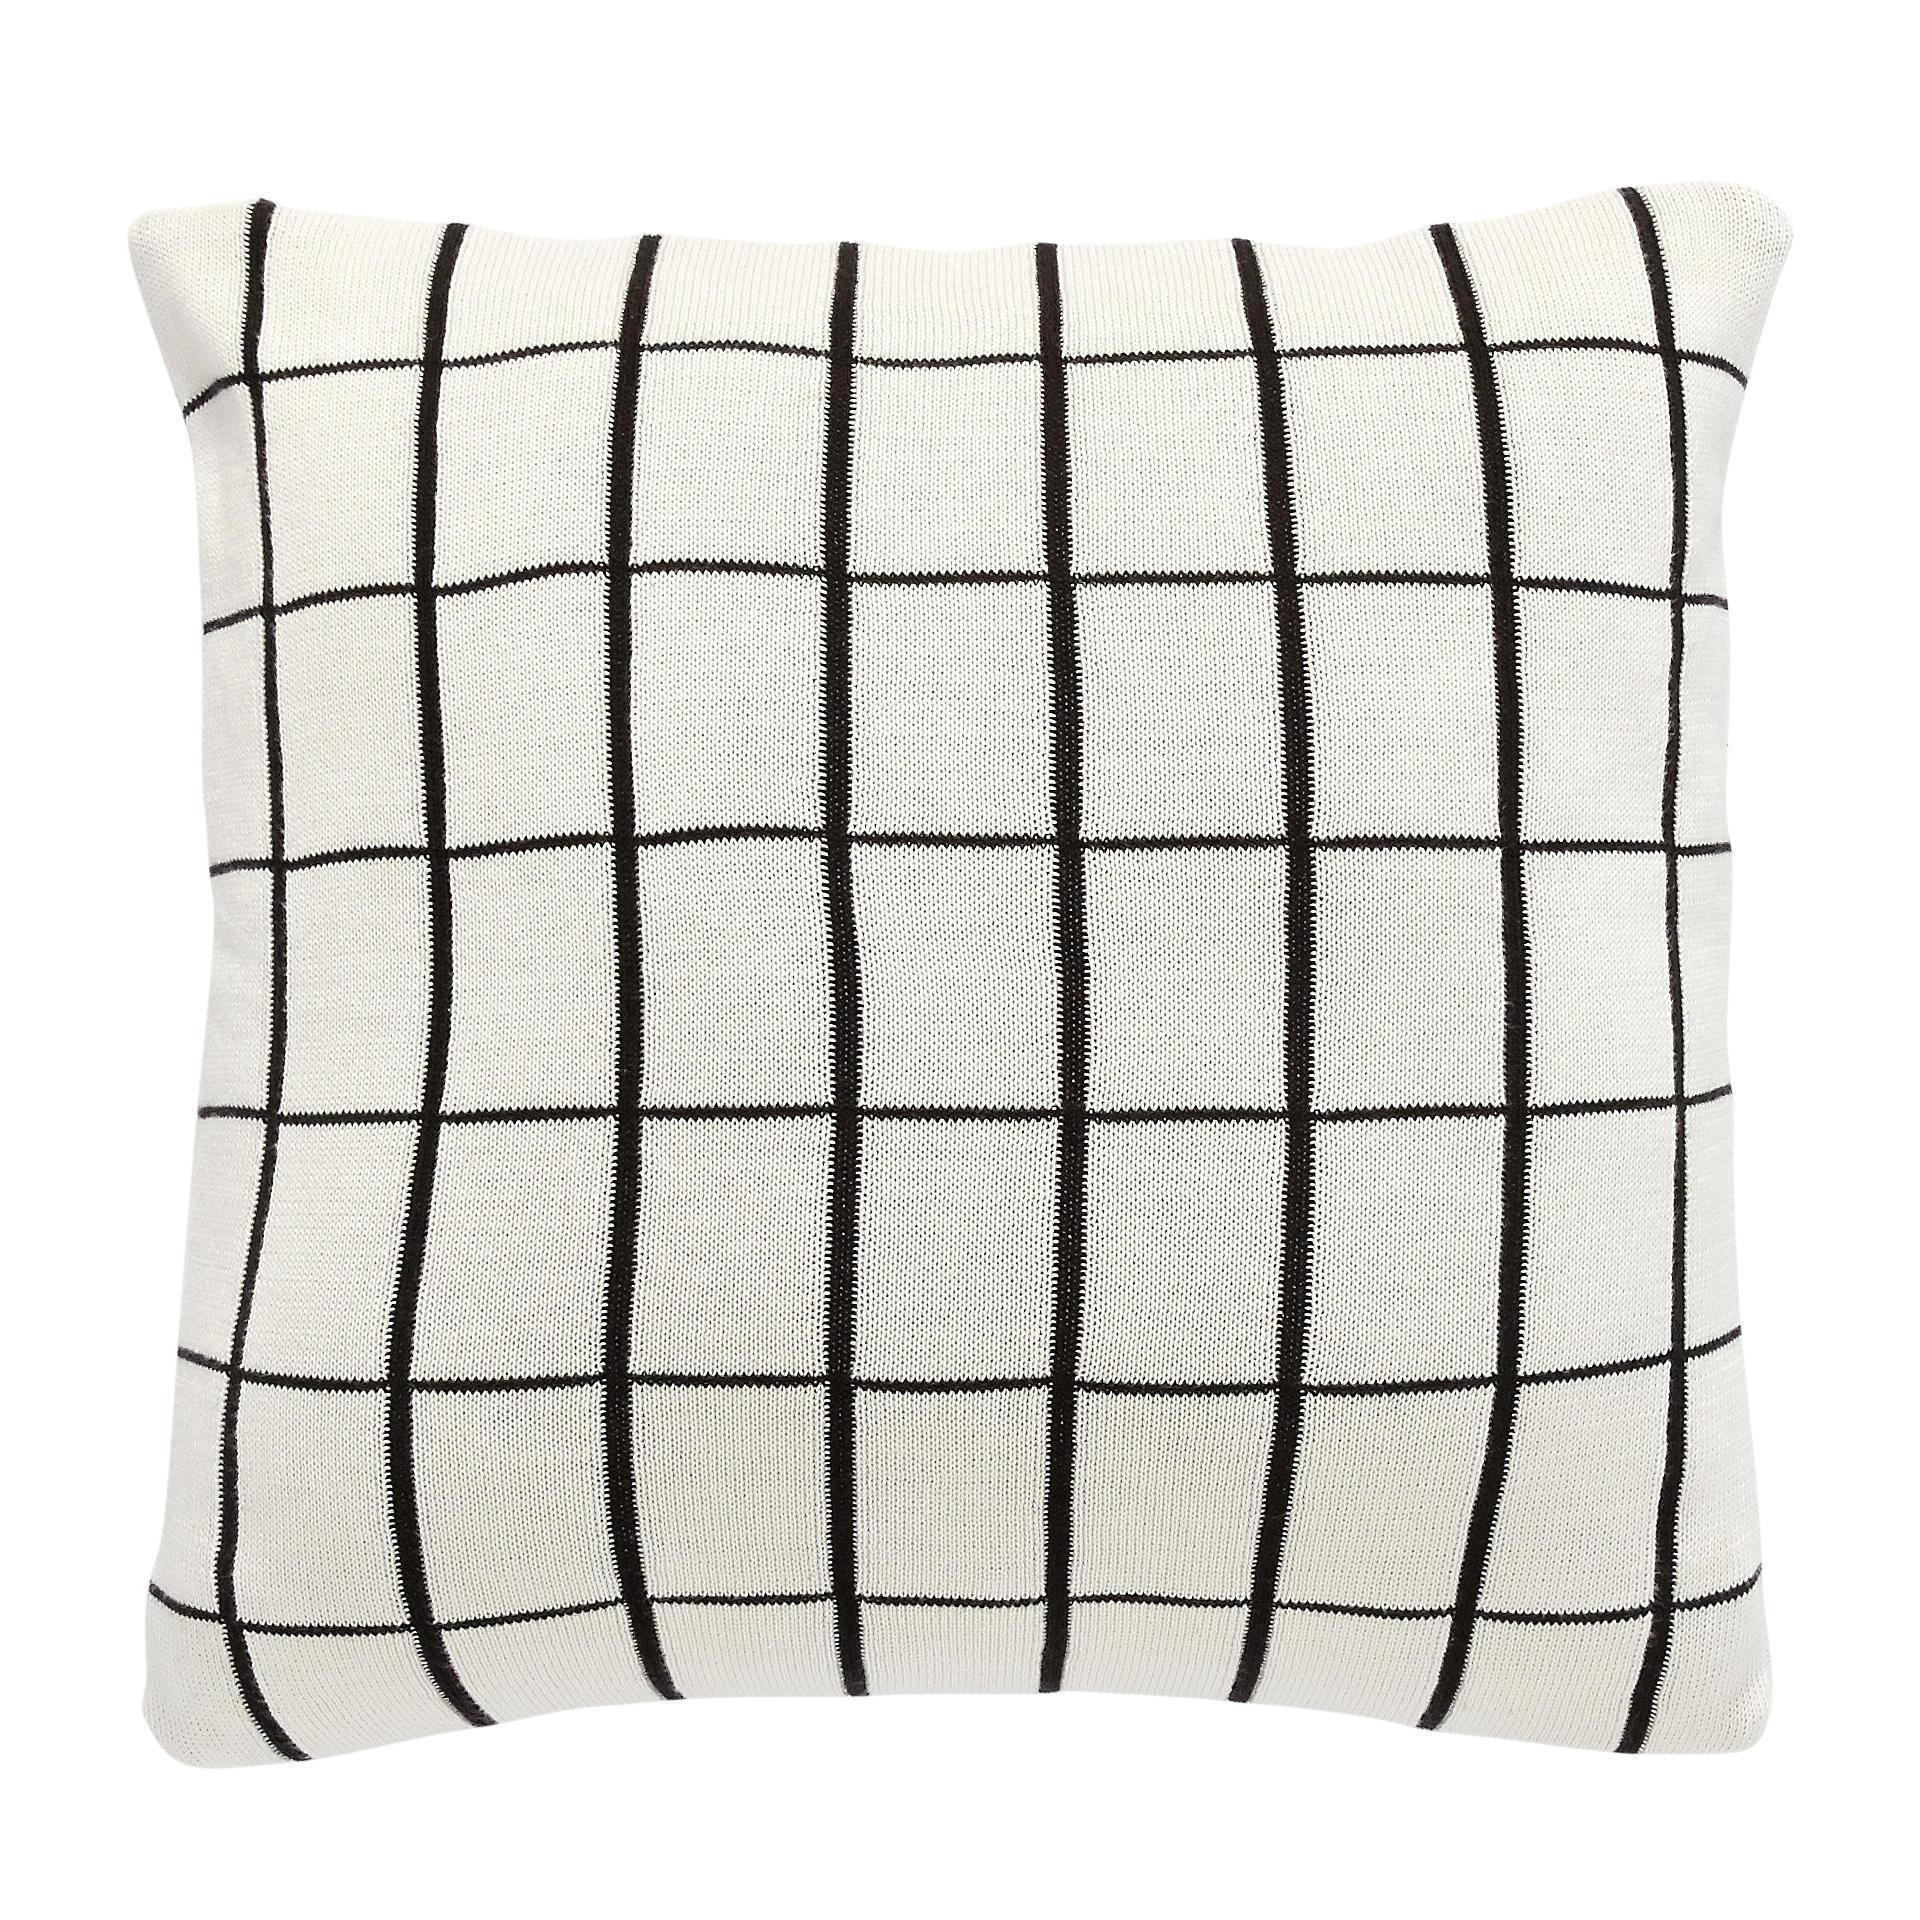 Hübsch Polštář Grid White 50x50 cm, bílá barva, textil